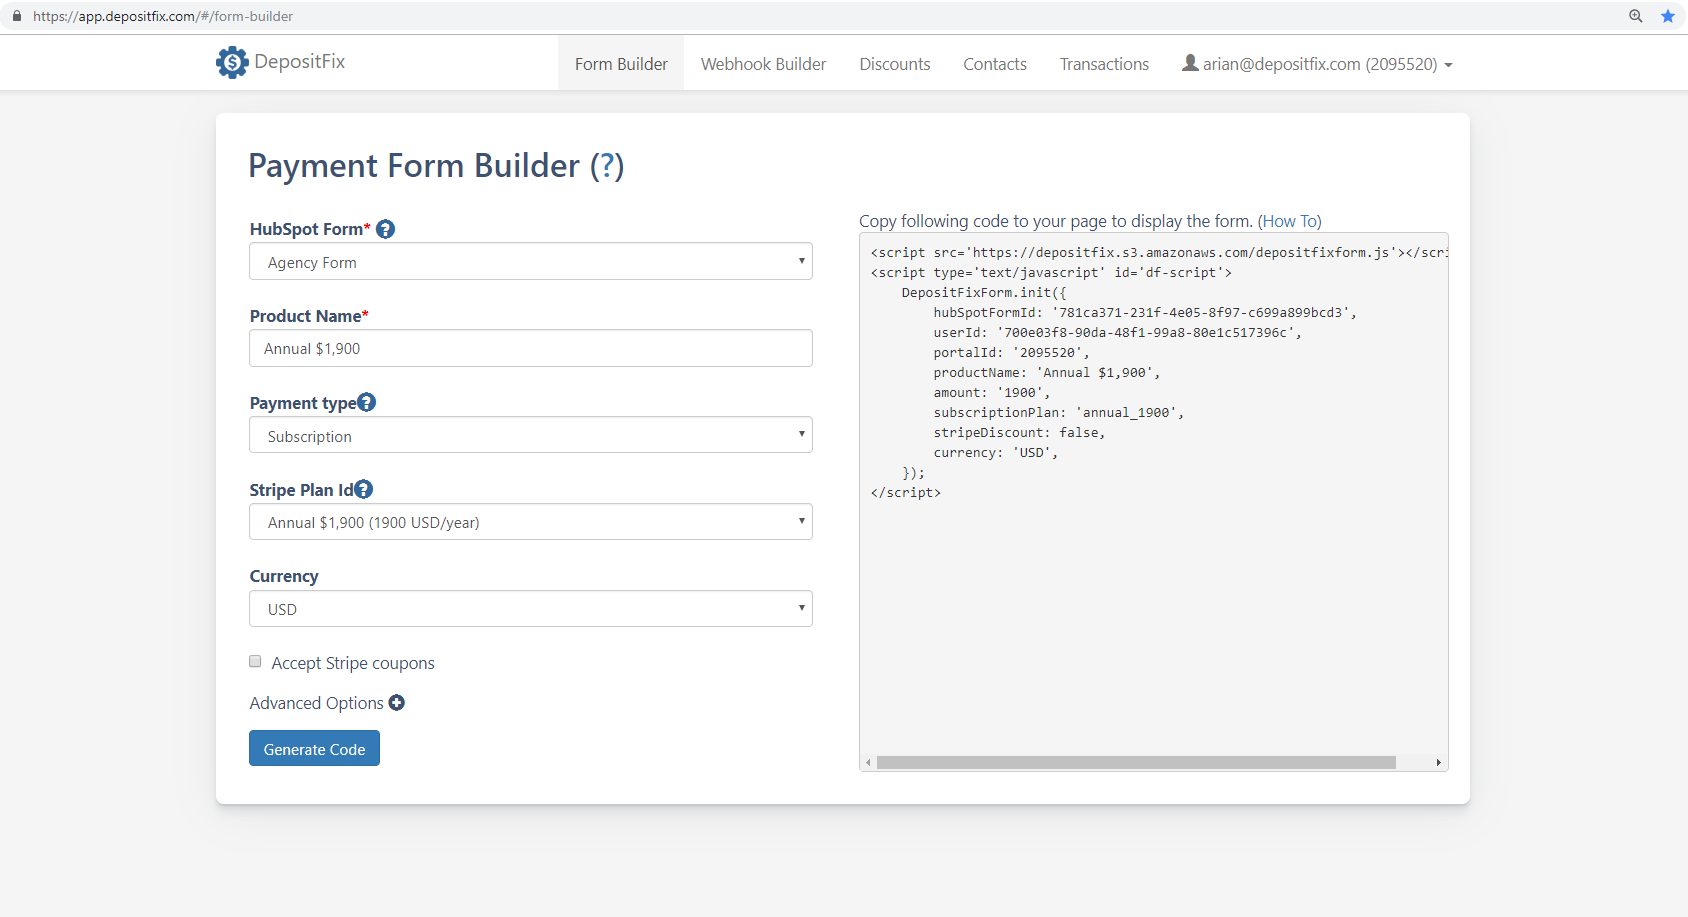 Depositfix - 4  Using Payment Form Builder